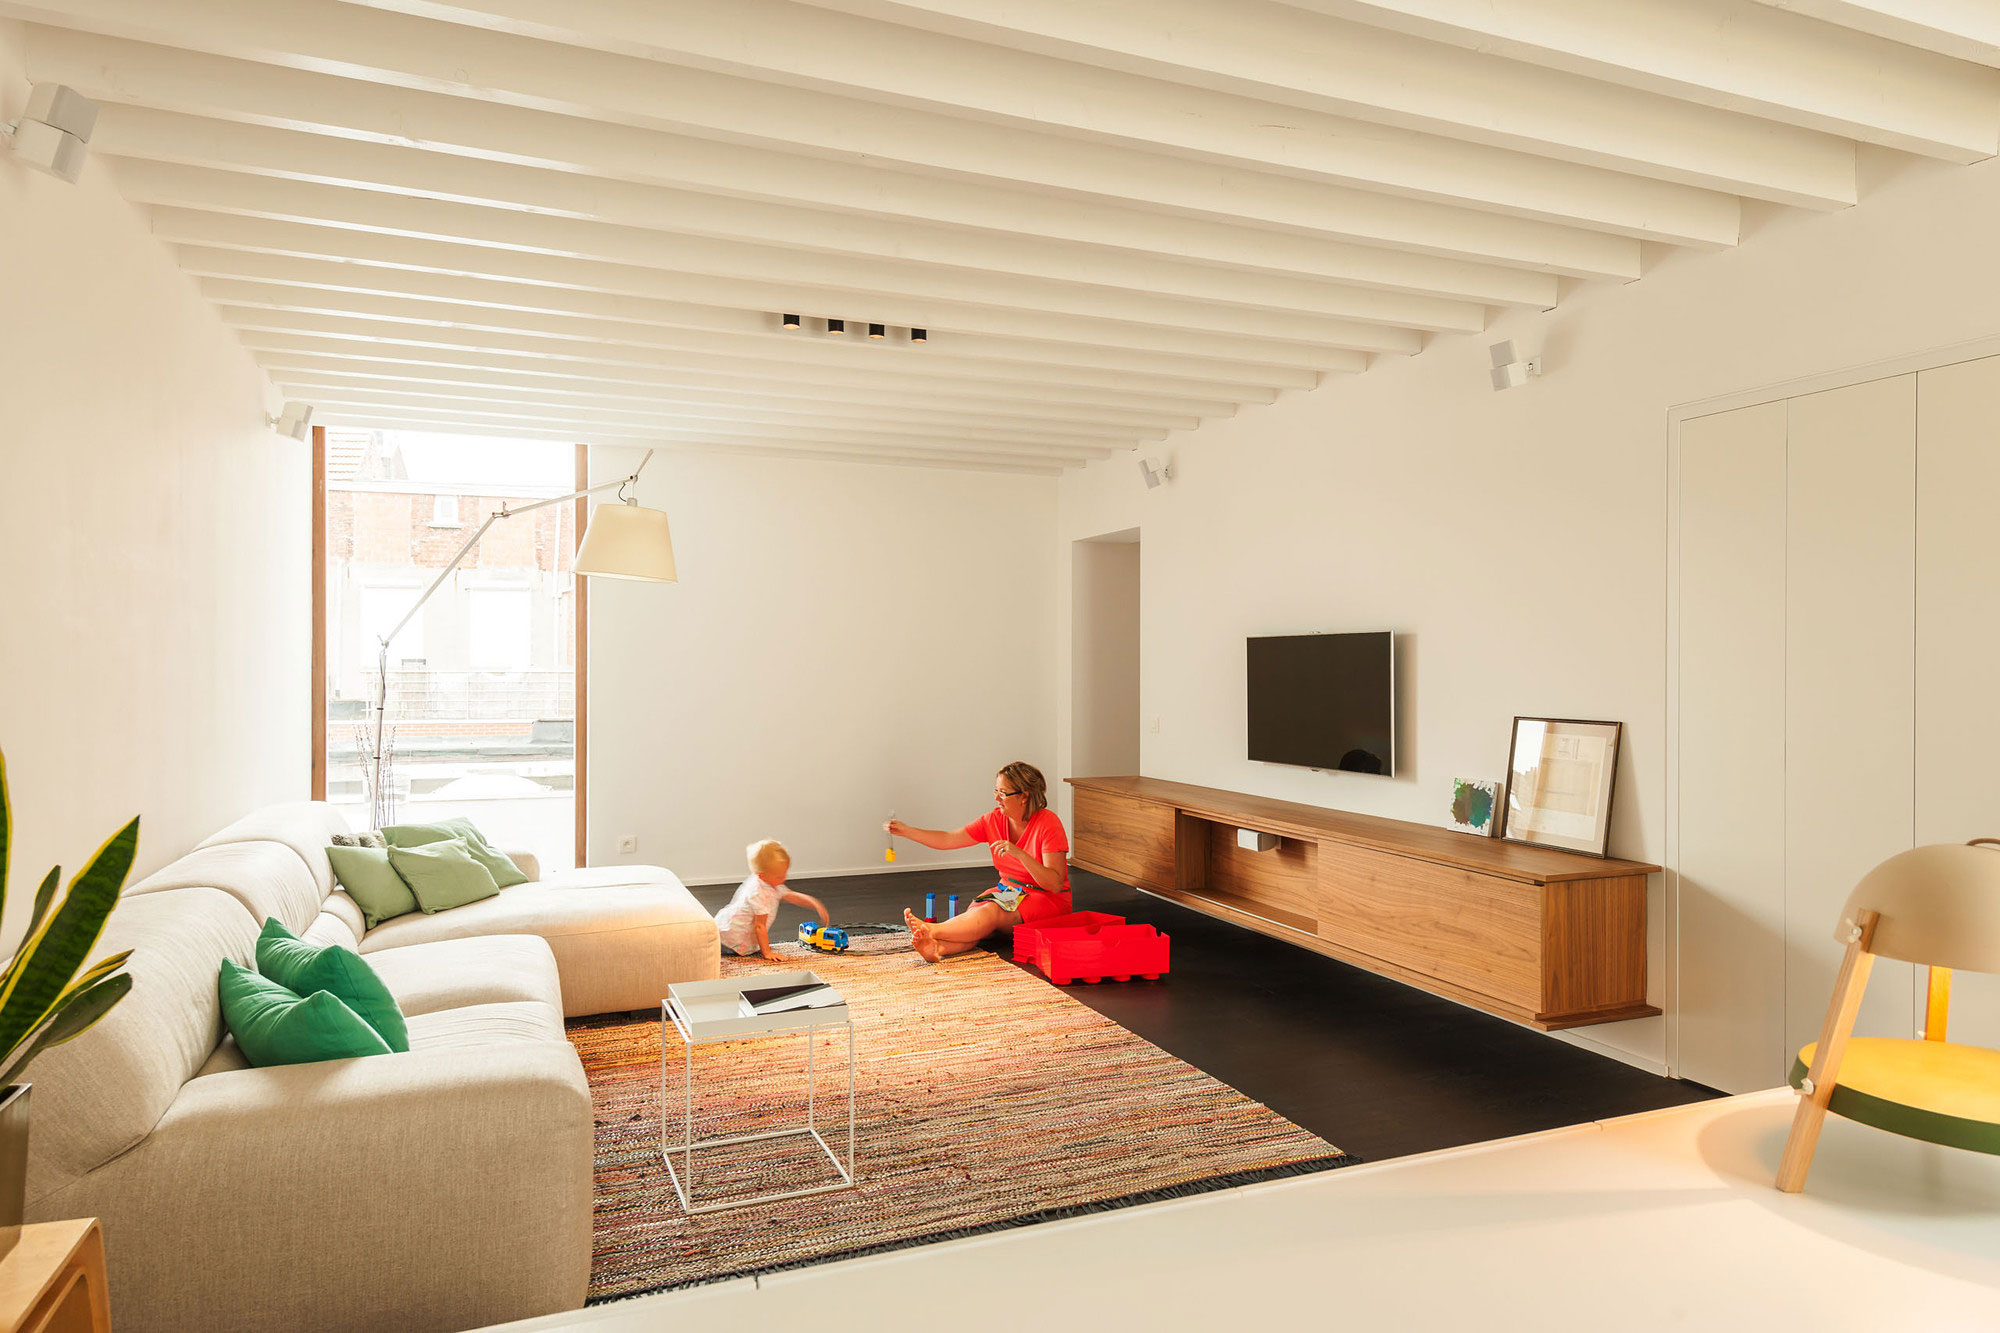 House LKS by P8 architecten